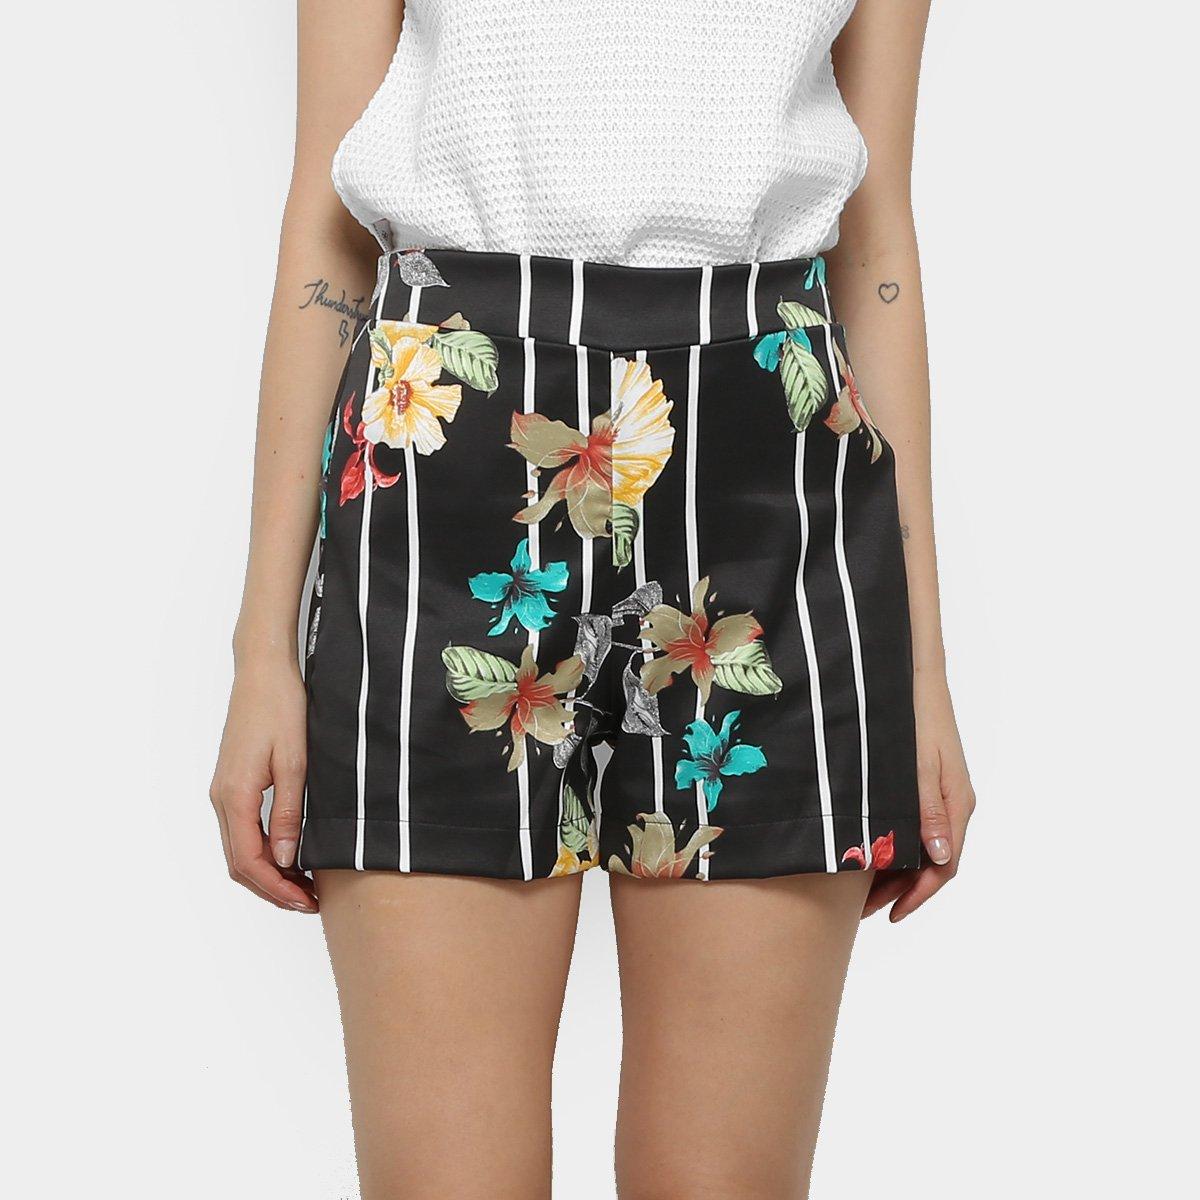 Foto 1 - Shorts Mercatto Hot Pants Listrado Floral Feminino